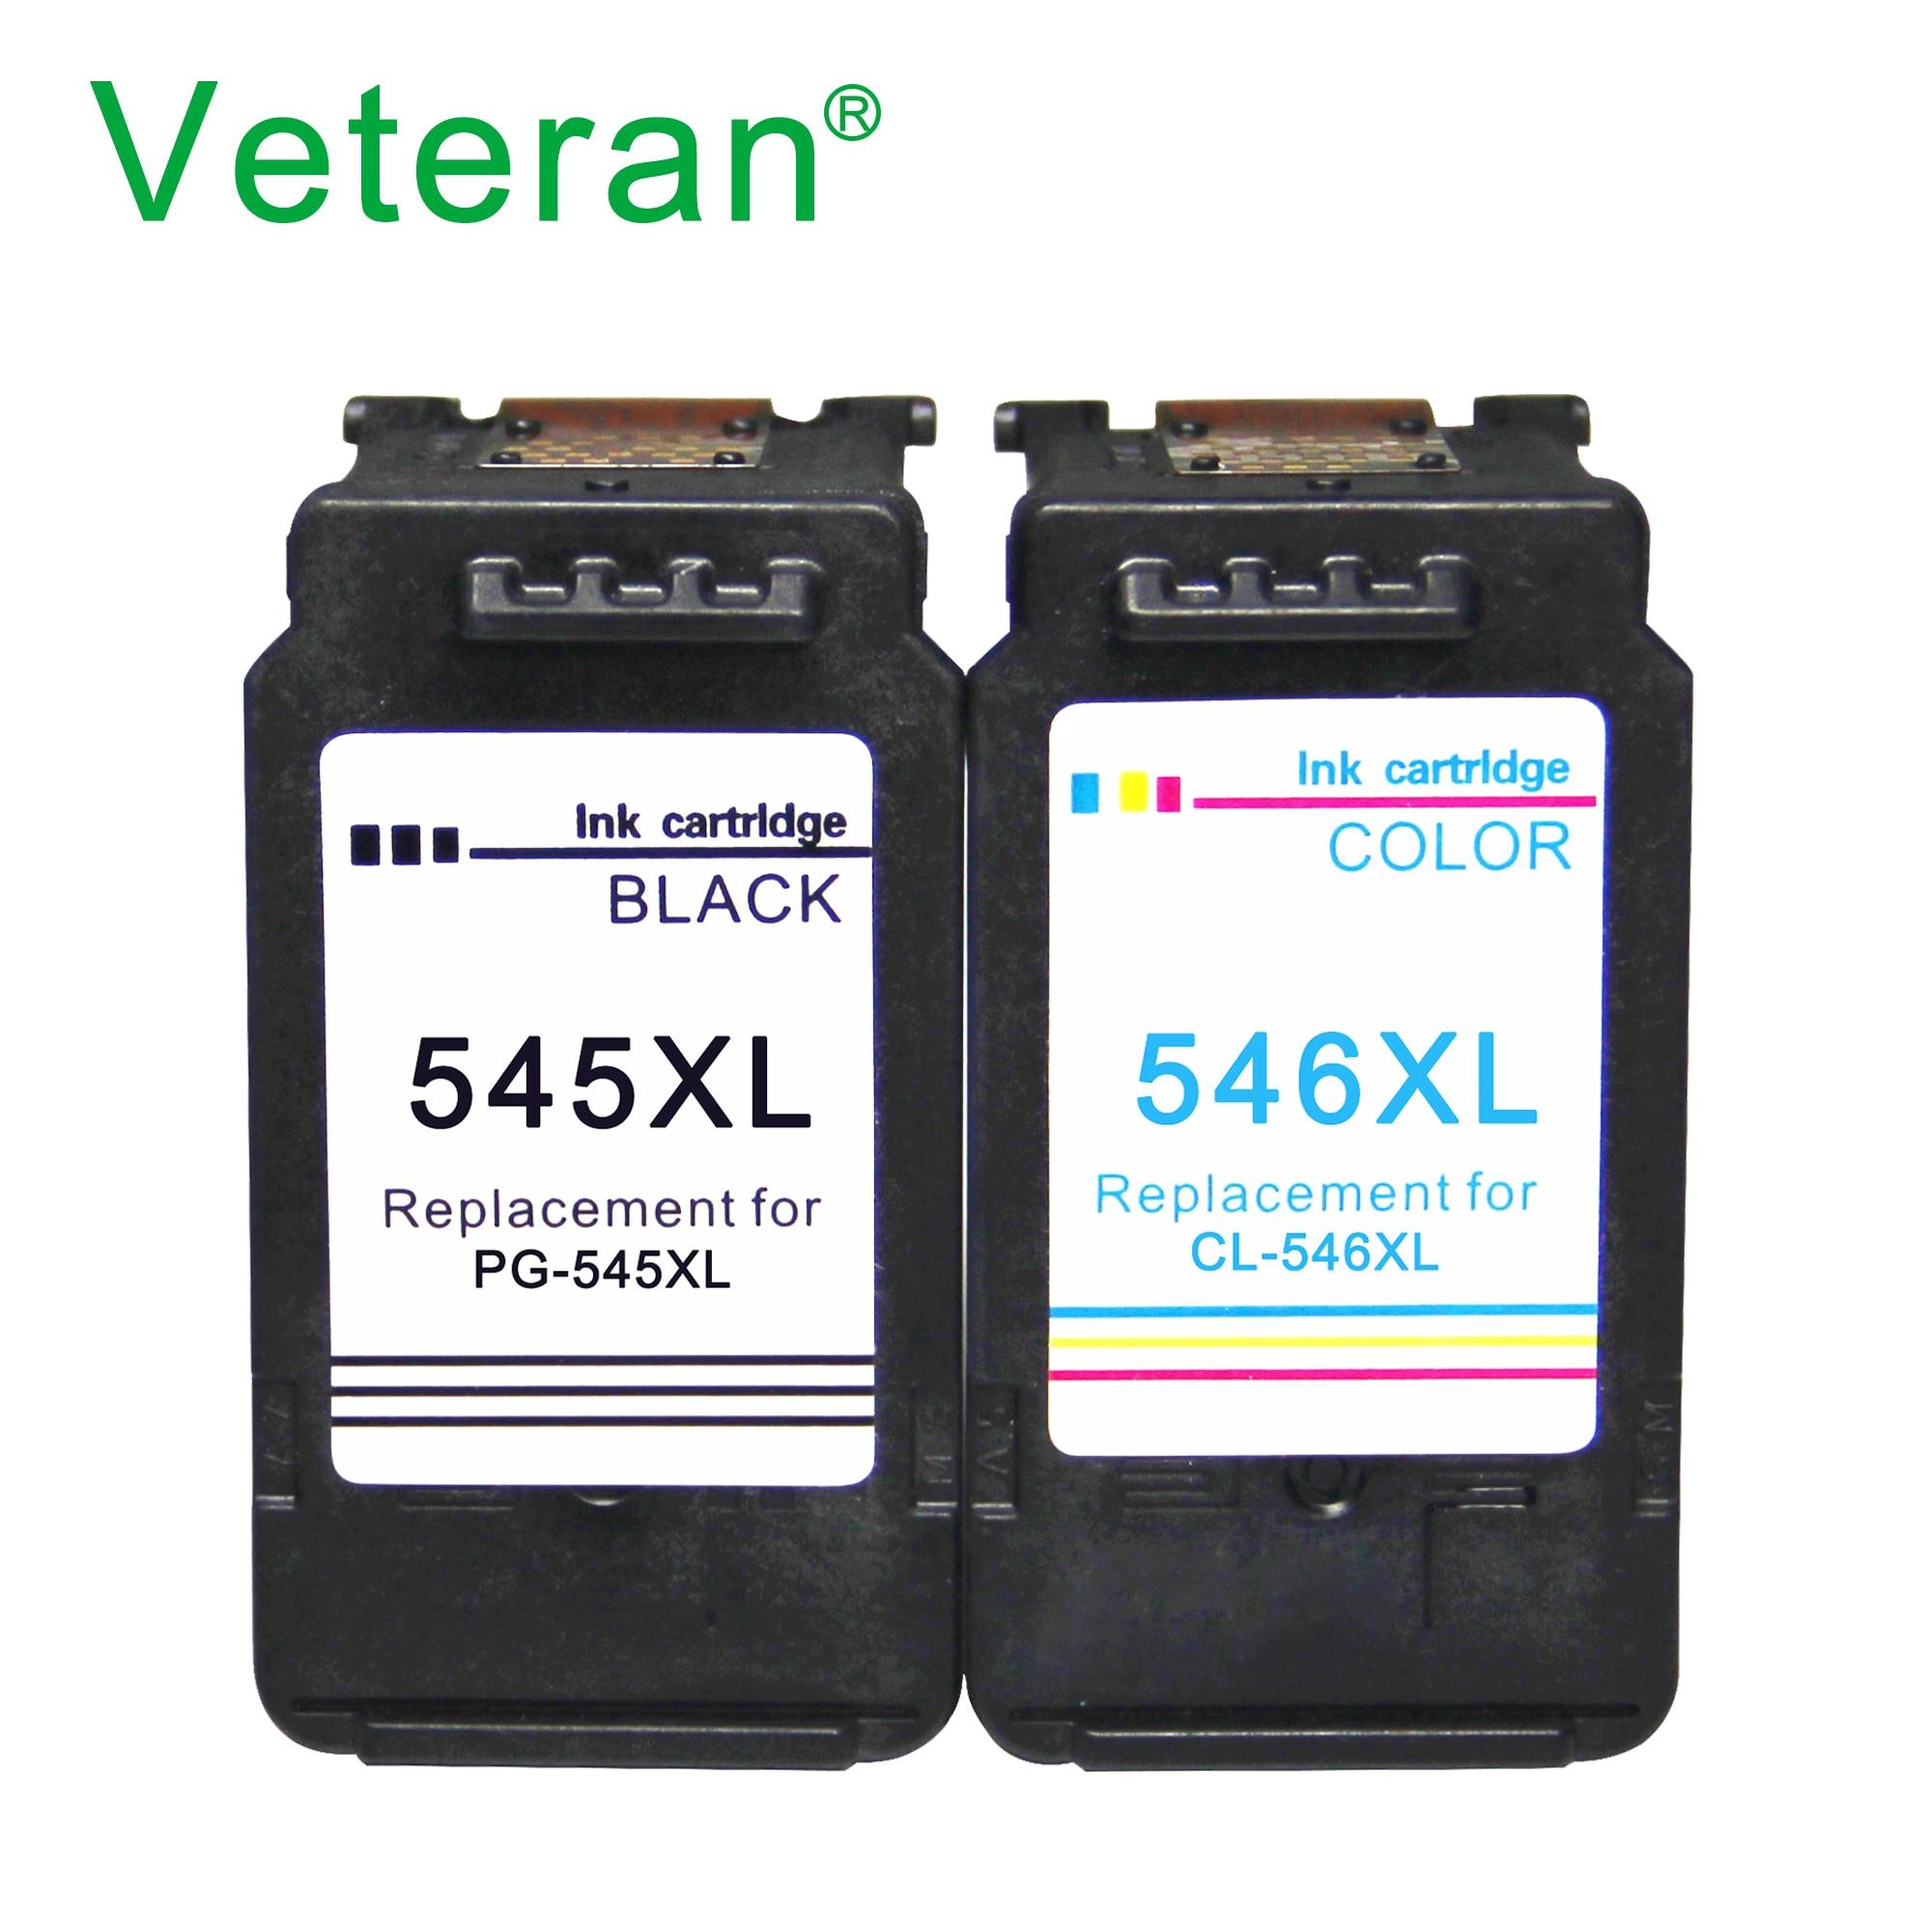 Veteran nachgefüllt PG545 CL546 Tinte Patrone für Canon PG 545 CL 546 545XL für Canon Pixma IP2850 MX495 MG2450 MG2550 MG2950 NS28